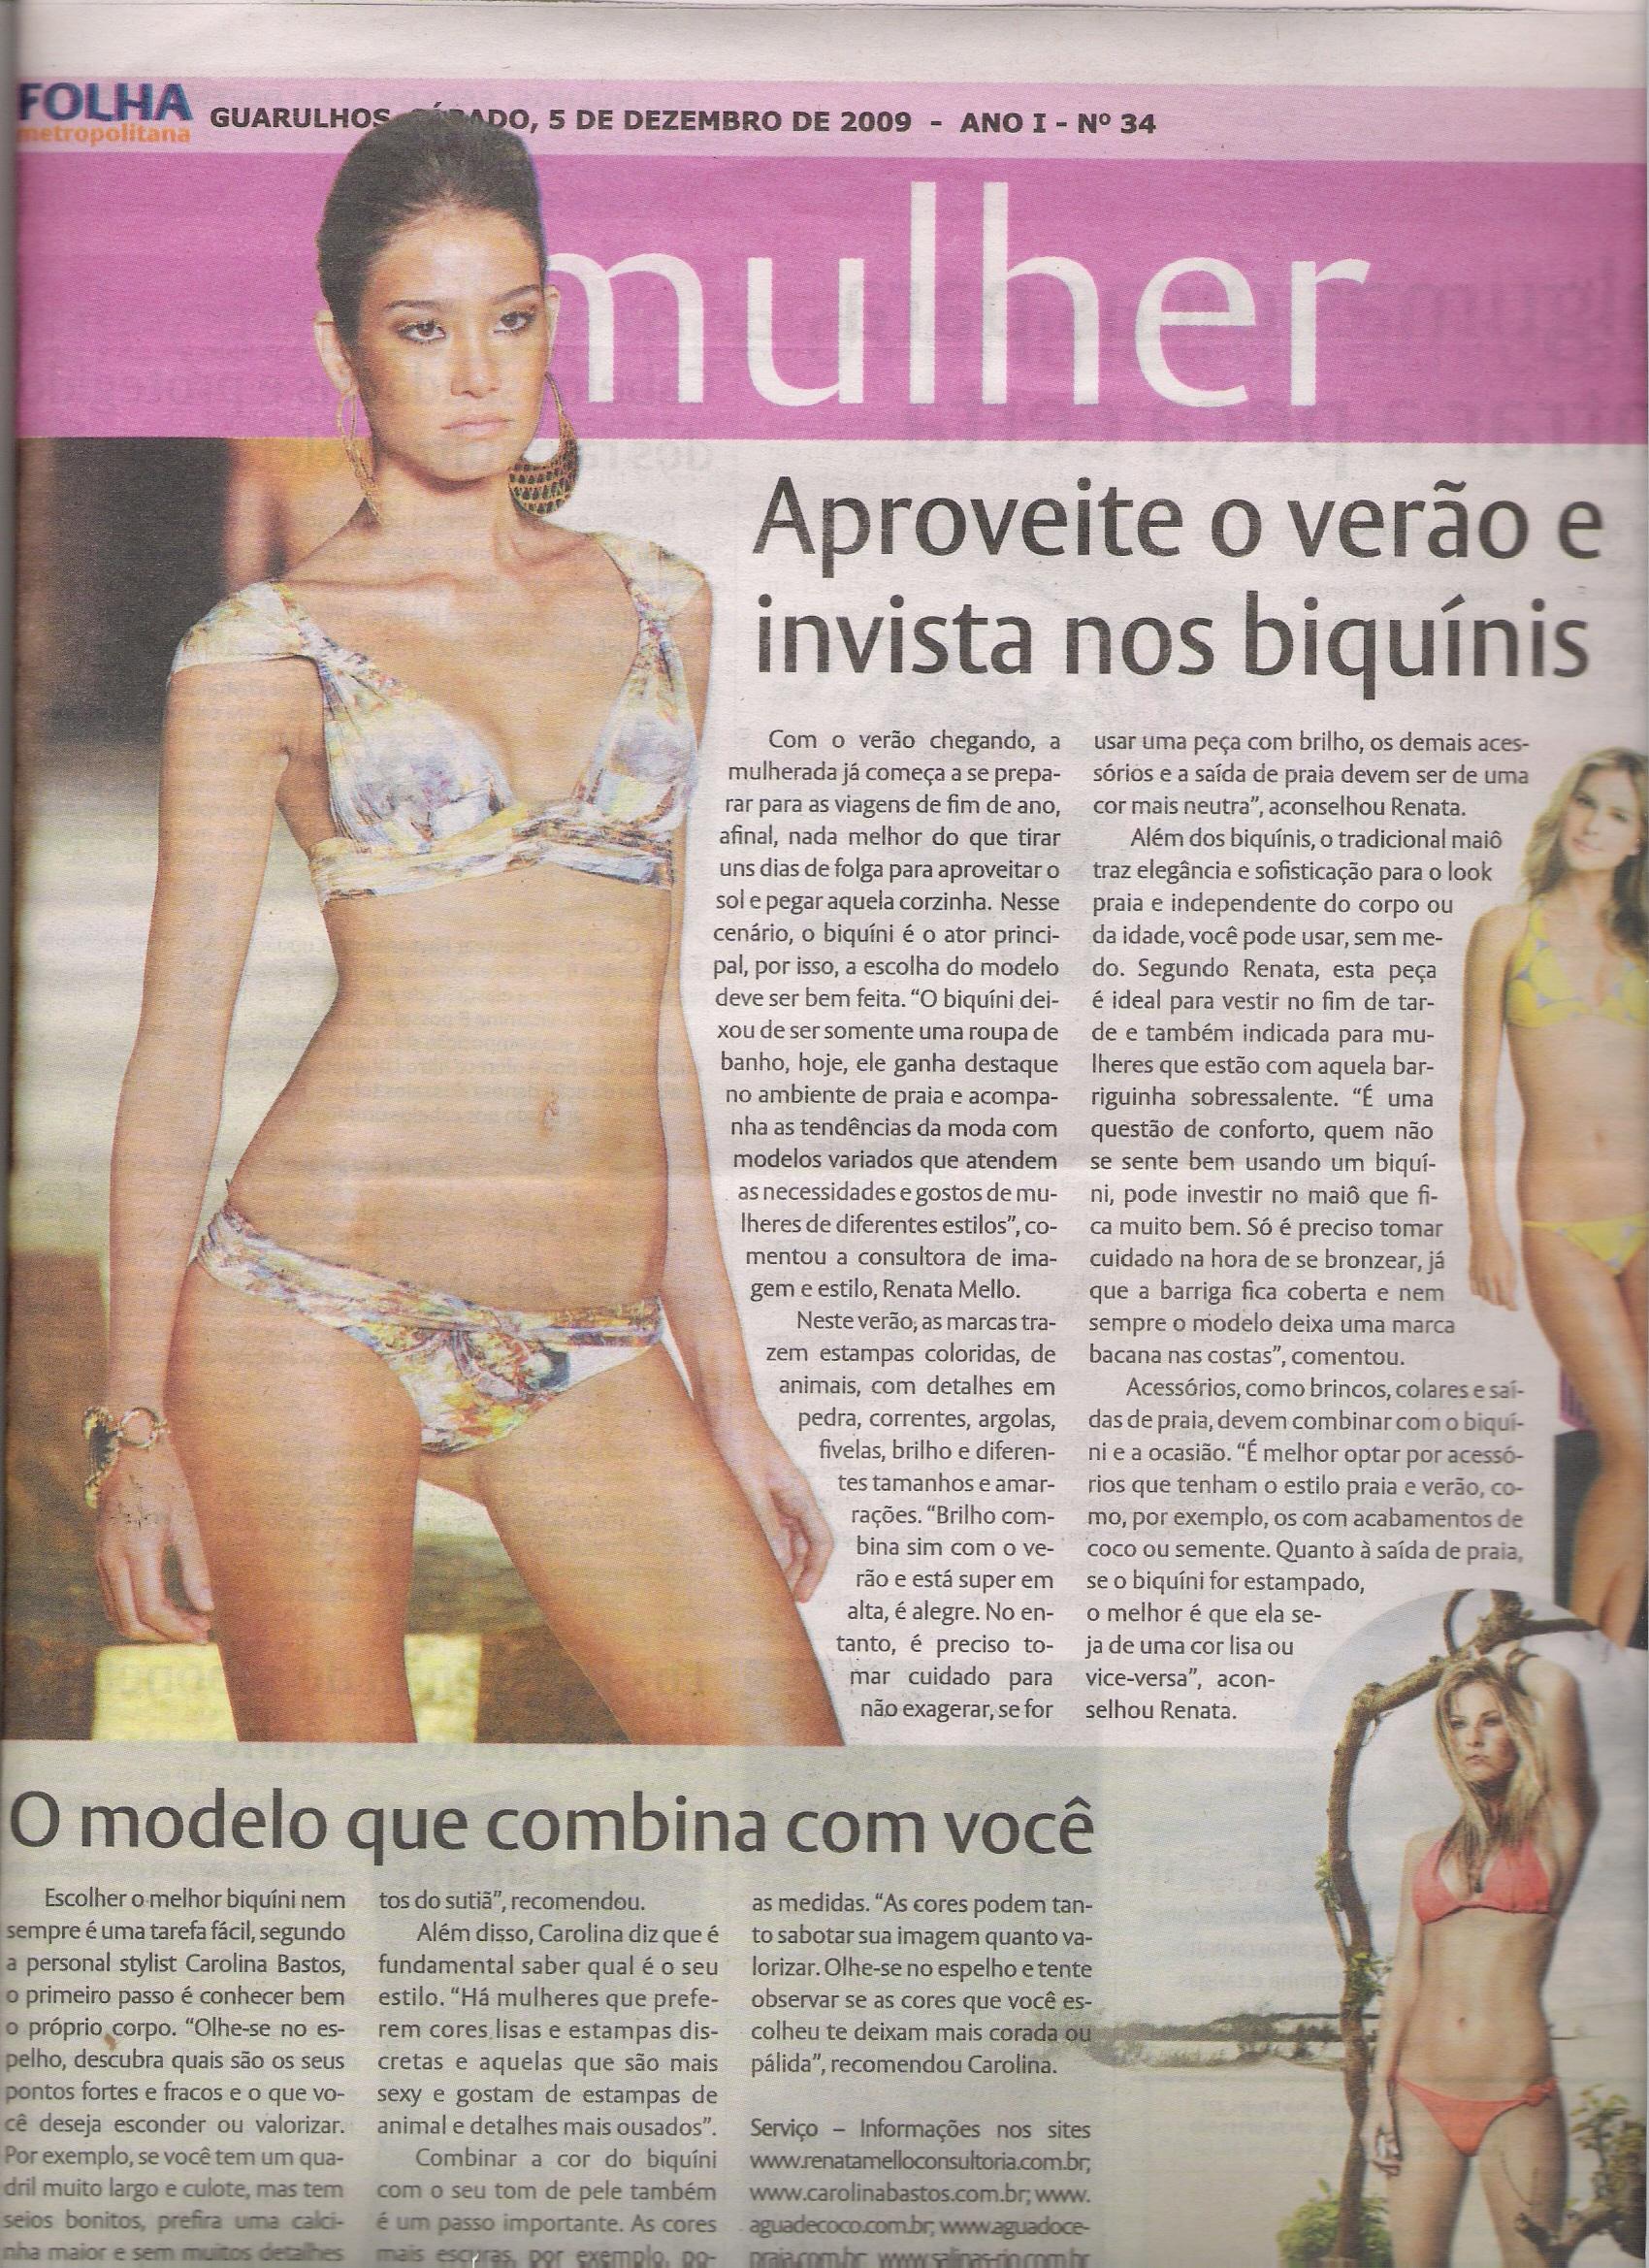 05/12/09 – Folha Metropolitana – Guarulhos